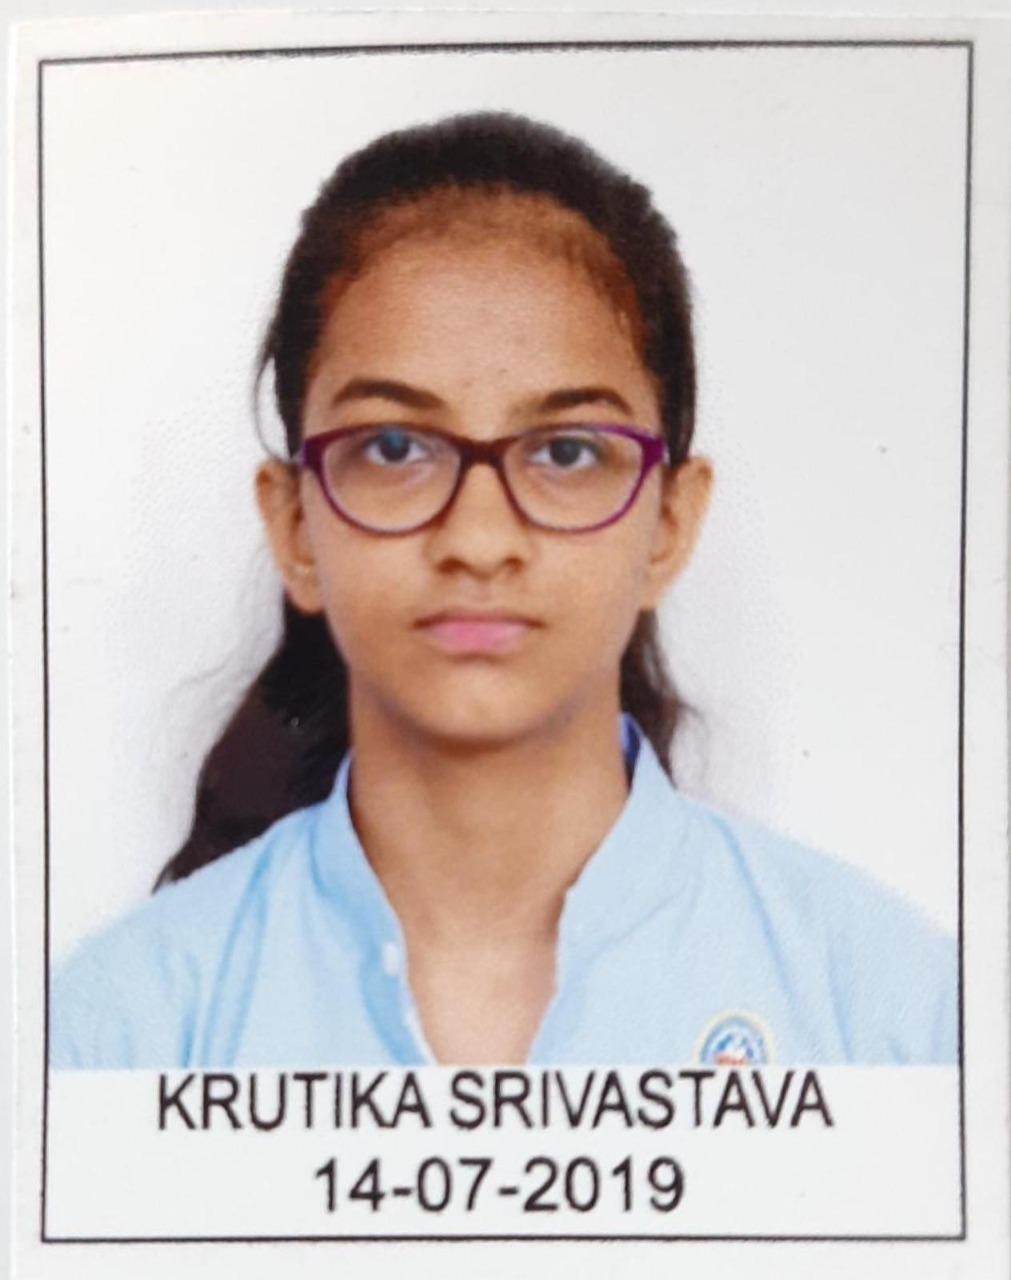 Krutika Srivastava